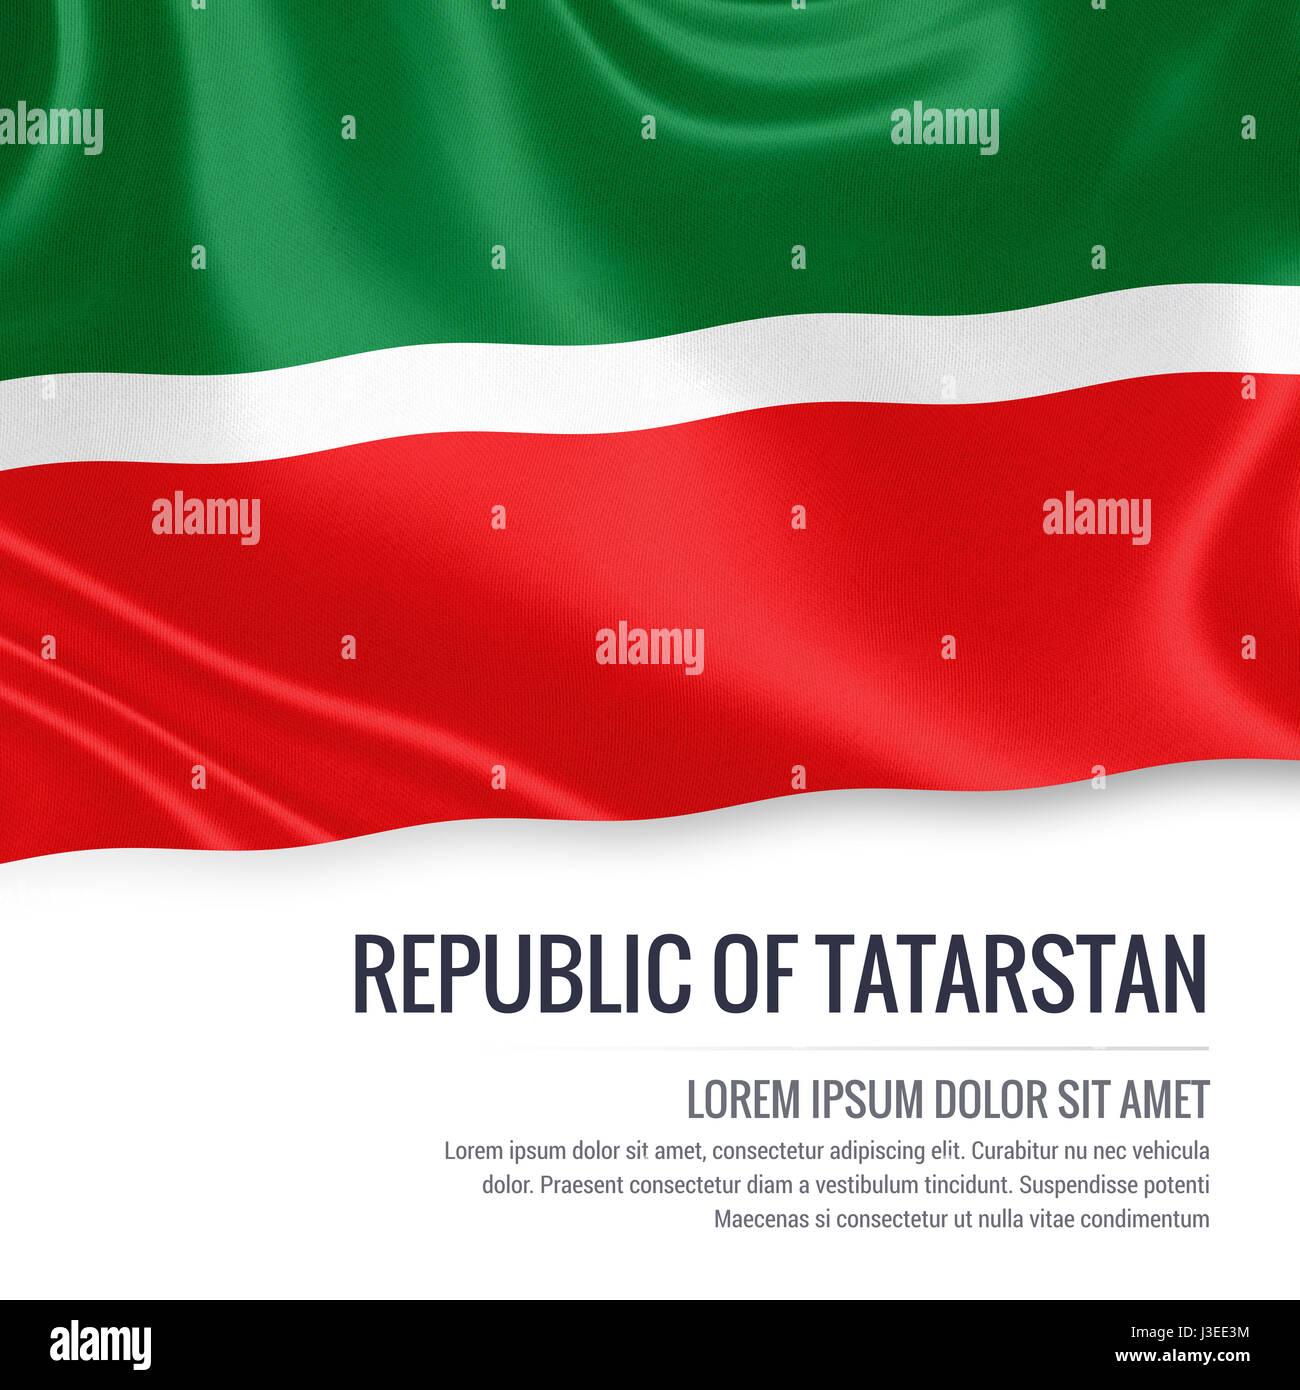 tatarstan flag stock photos tatarstan flag stock images alamy